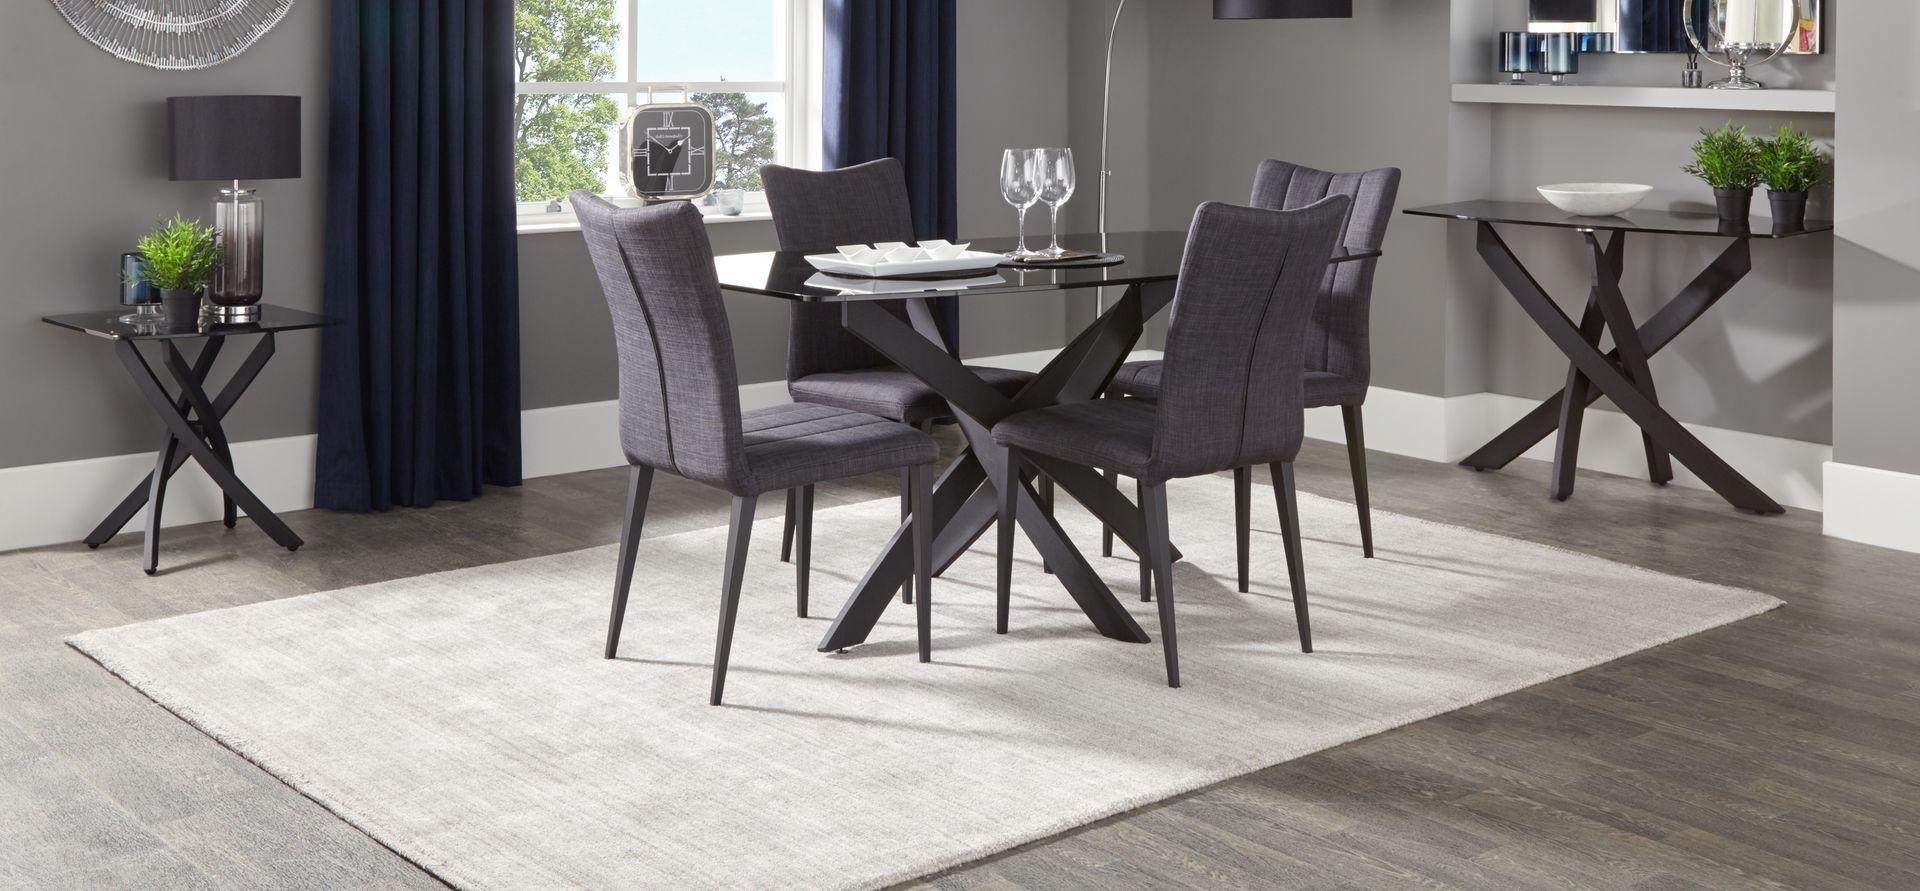 Scs Dining Room Furniture – Cheekybeaglestudios For Most Popular Scs Dining Room Furniture (View 3 of 25)